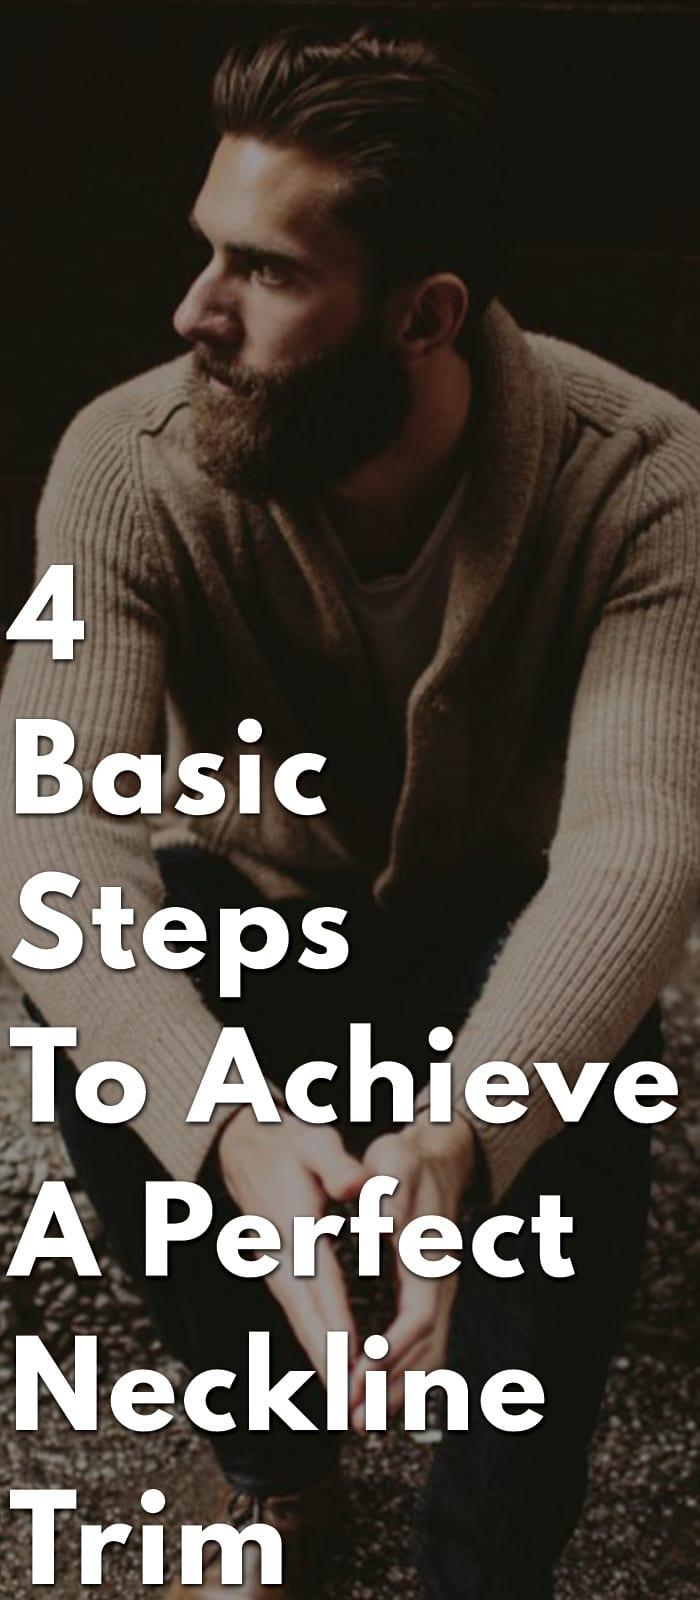 4-Basic-Steps-To-Achieve-A-Perfect-Neckline-Trim.